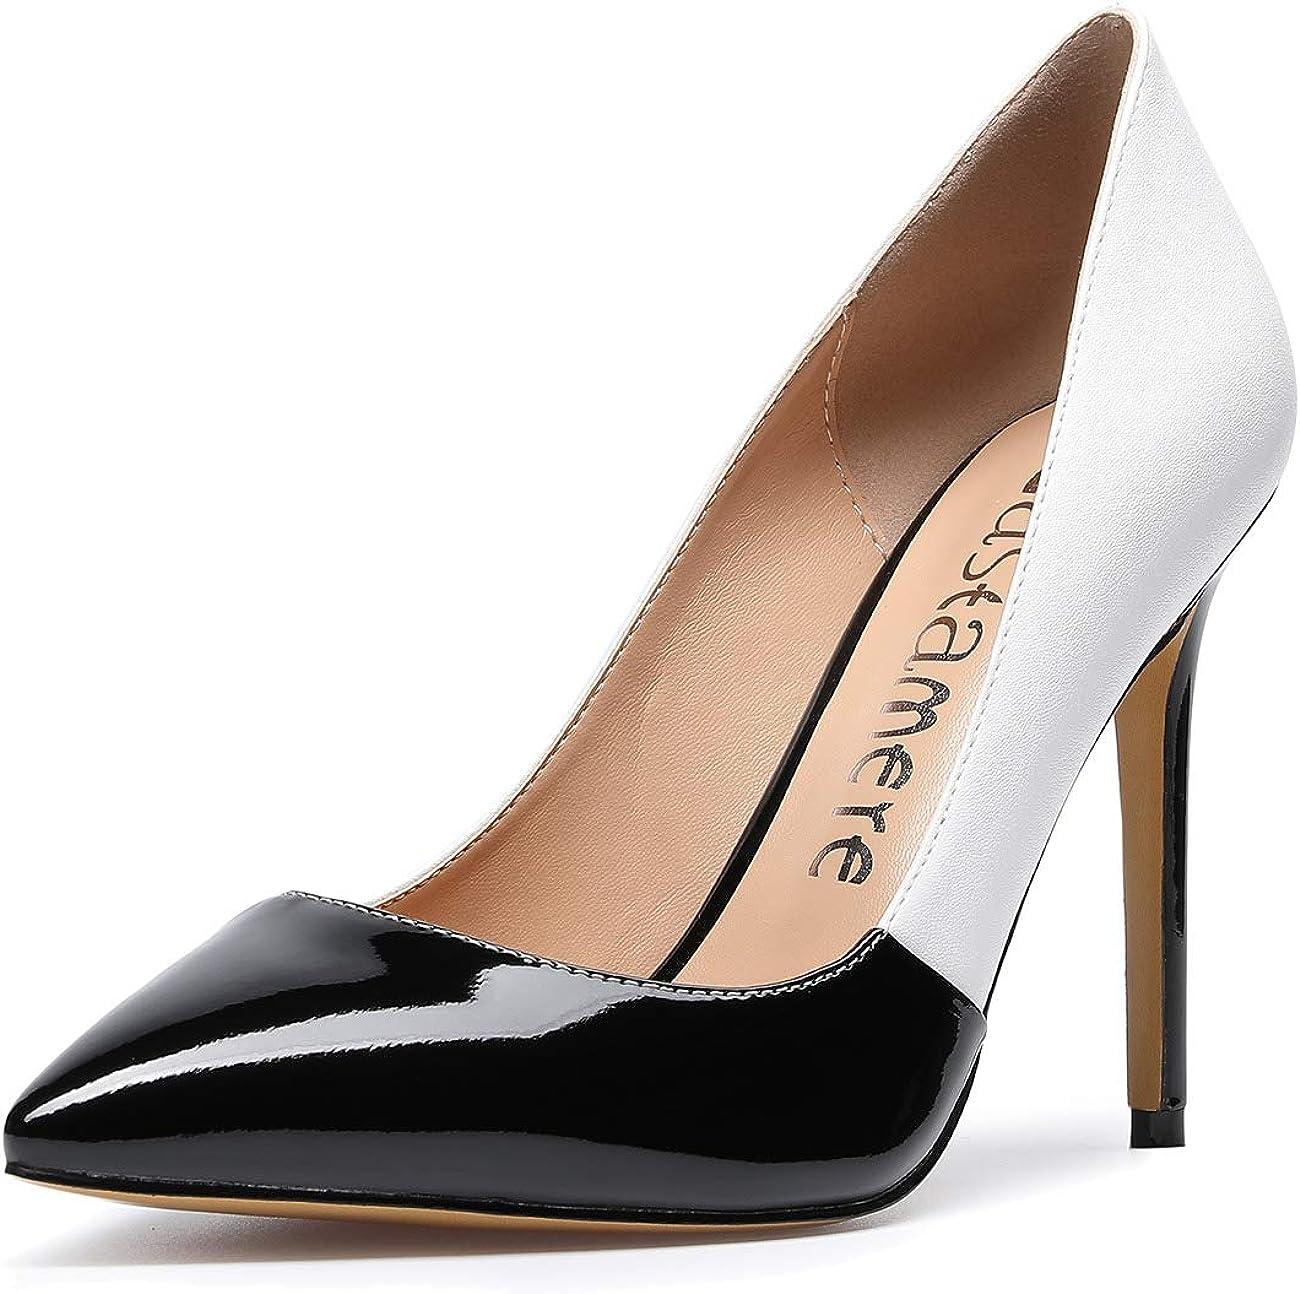 CASTAMERE Zapatos de Tacón Mujer Tacón de Aguja 10CM Tacón